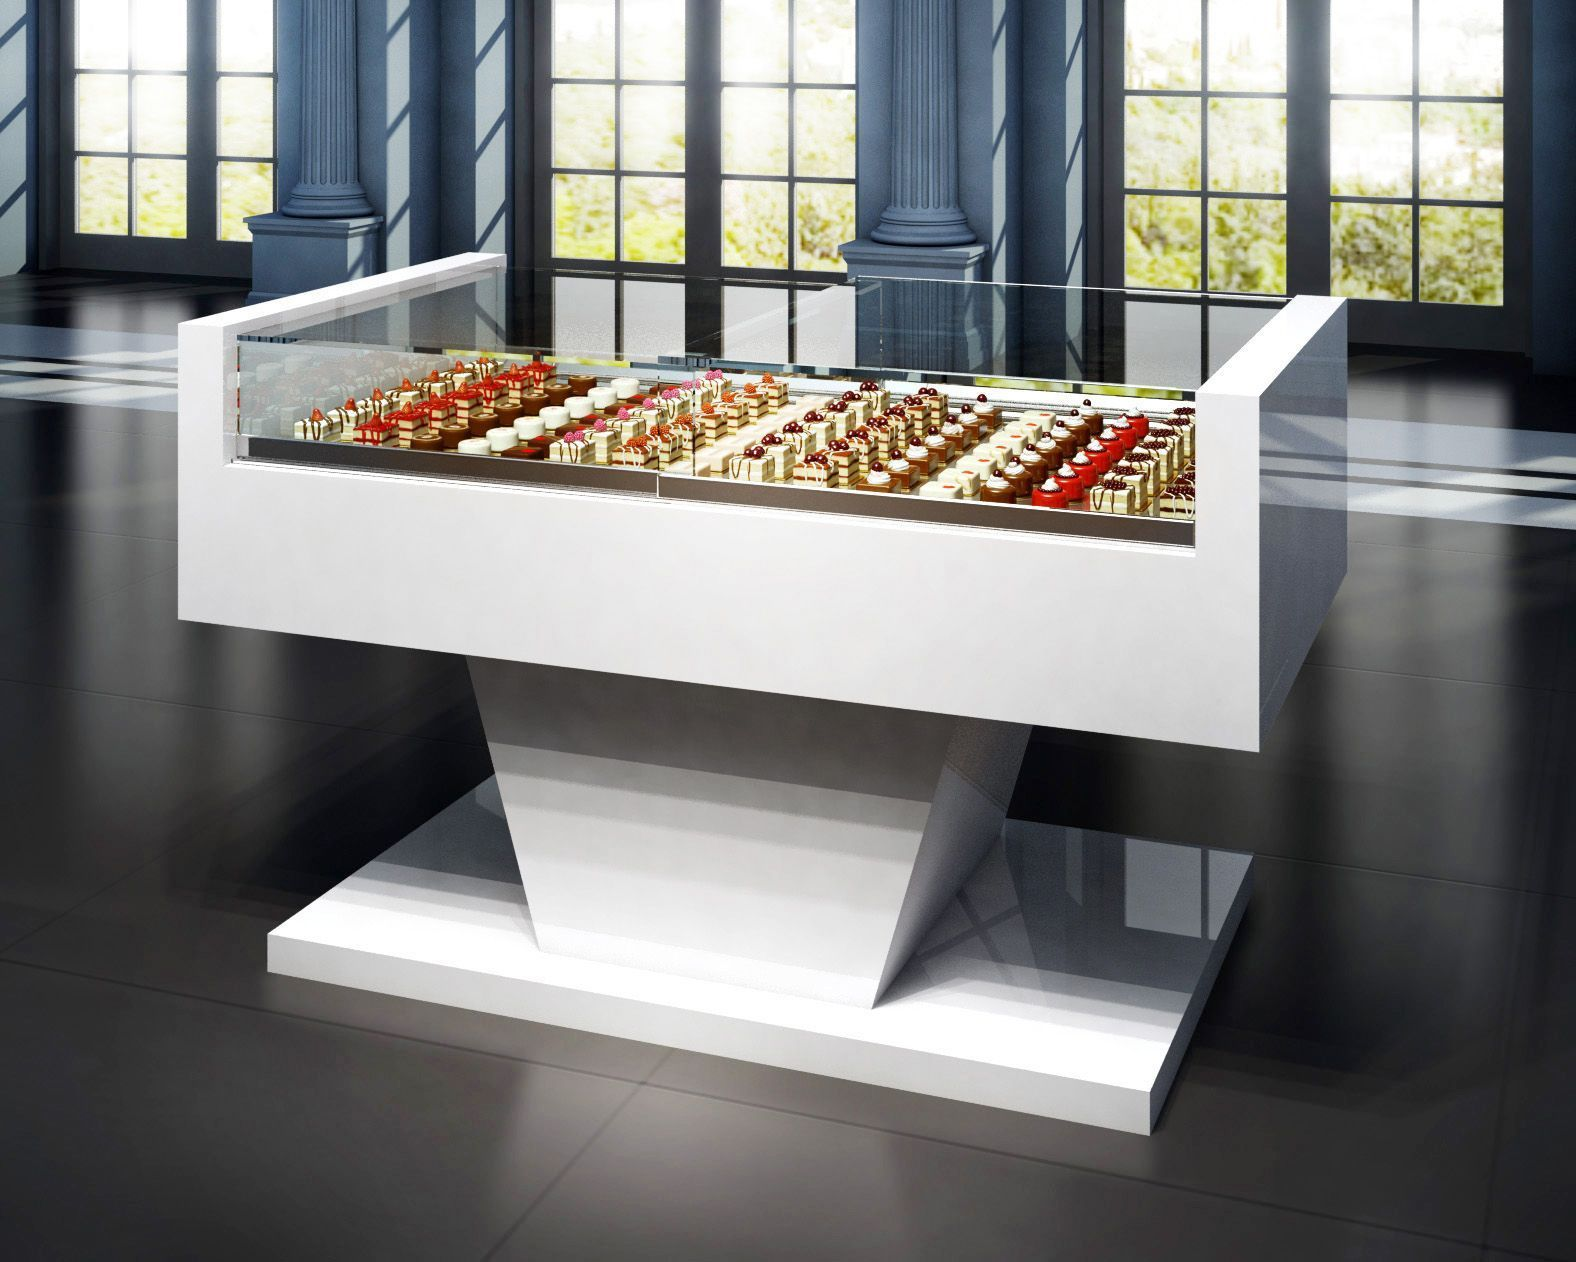 vitrinas refigeradas - vitrinas de pastelería - grupo granita